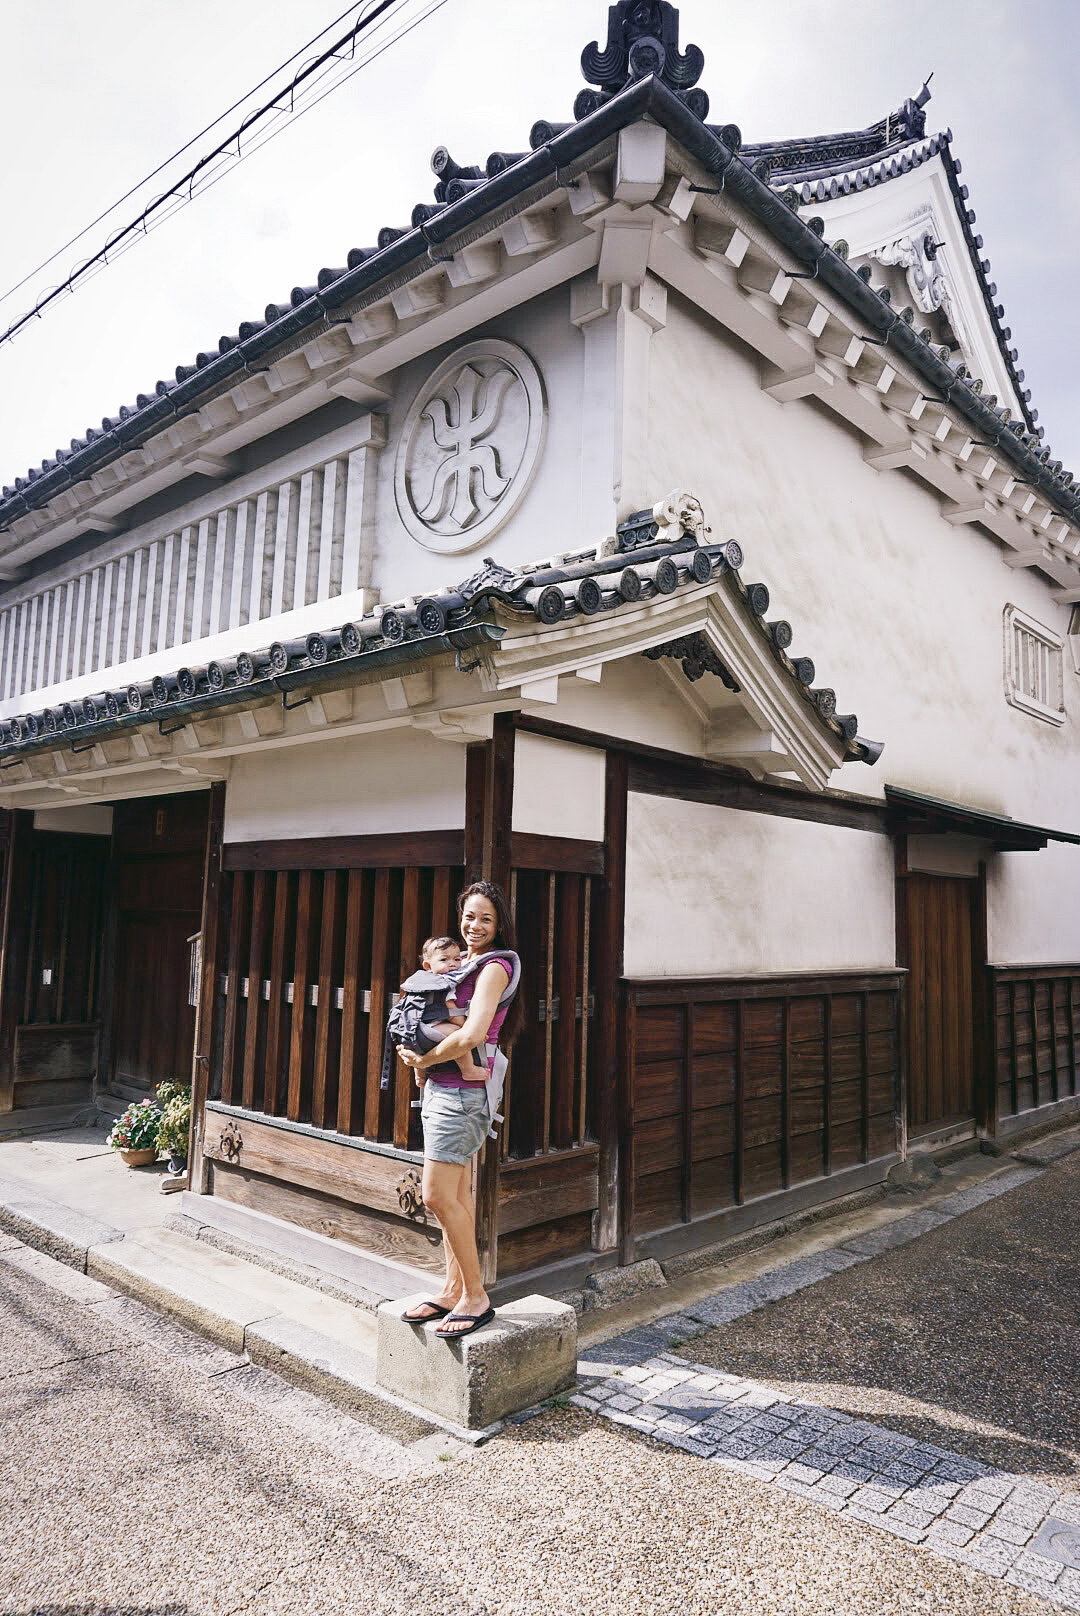 Toyodake Residence